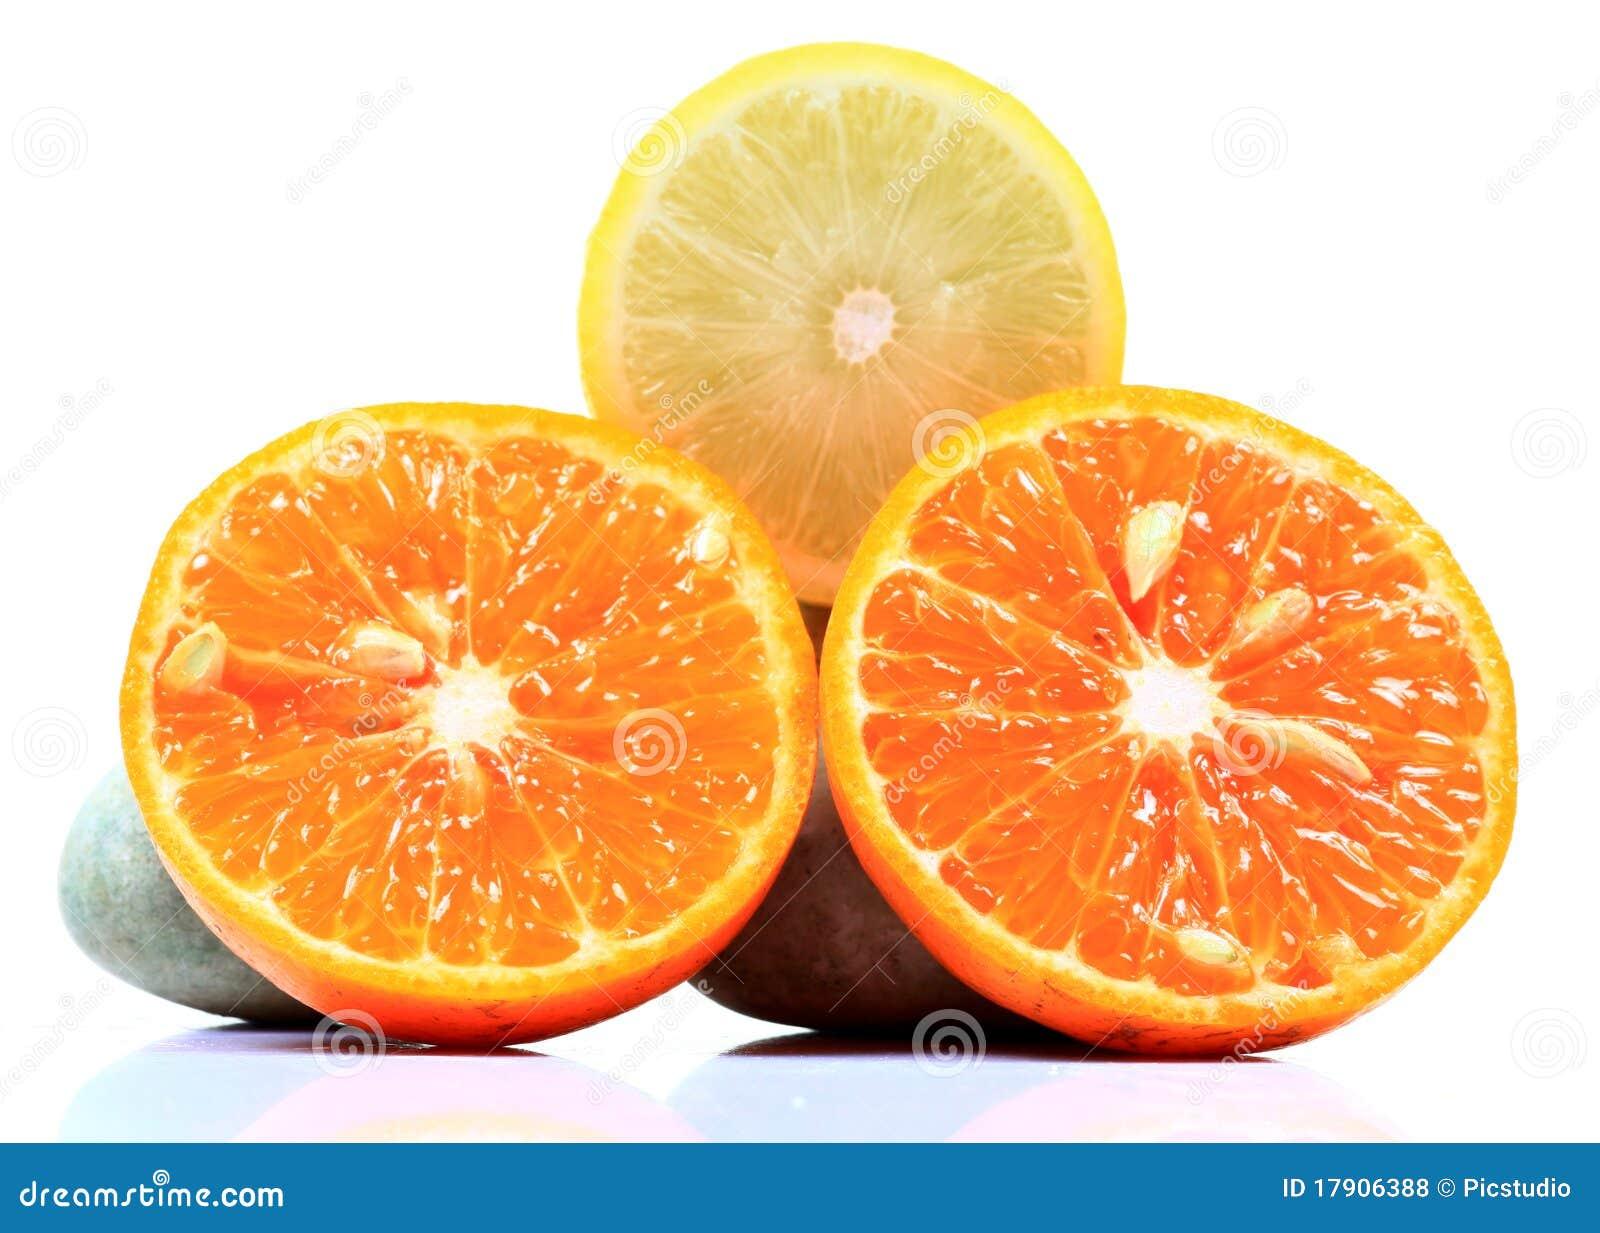 juicy fruits stock photo image of nature ingredient 17906388